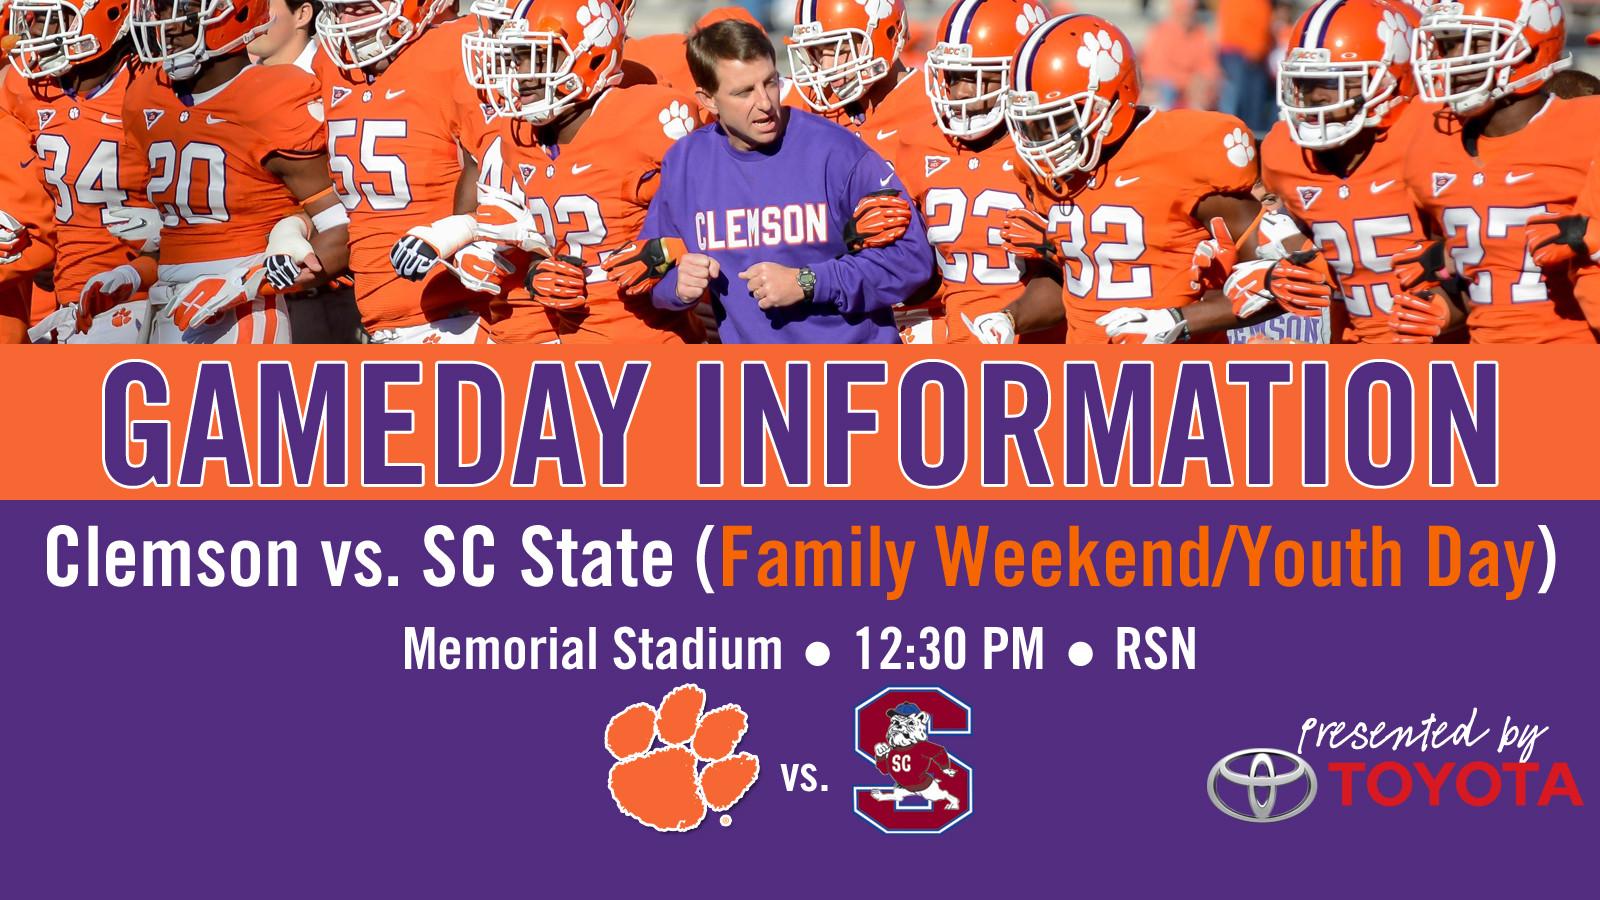 Clemson vs. SC State Football Gameday Information Guide